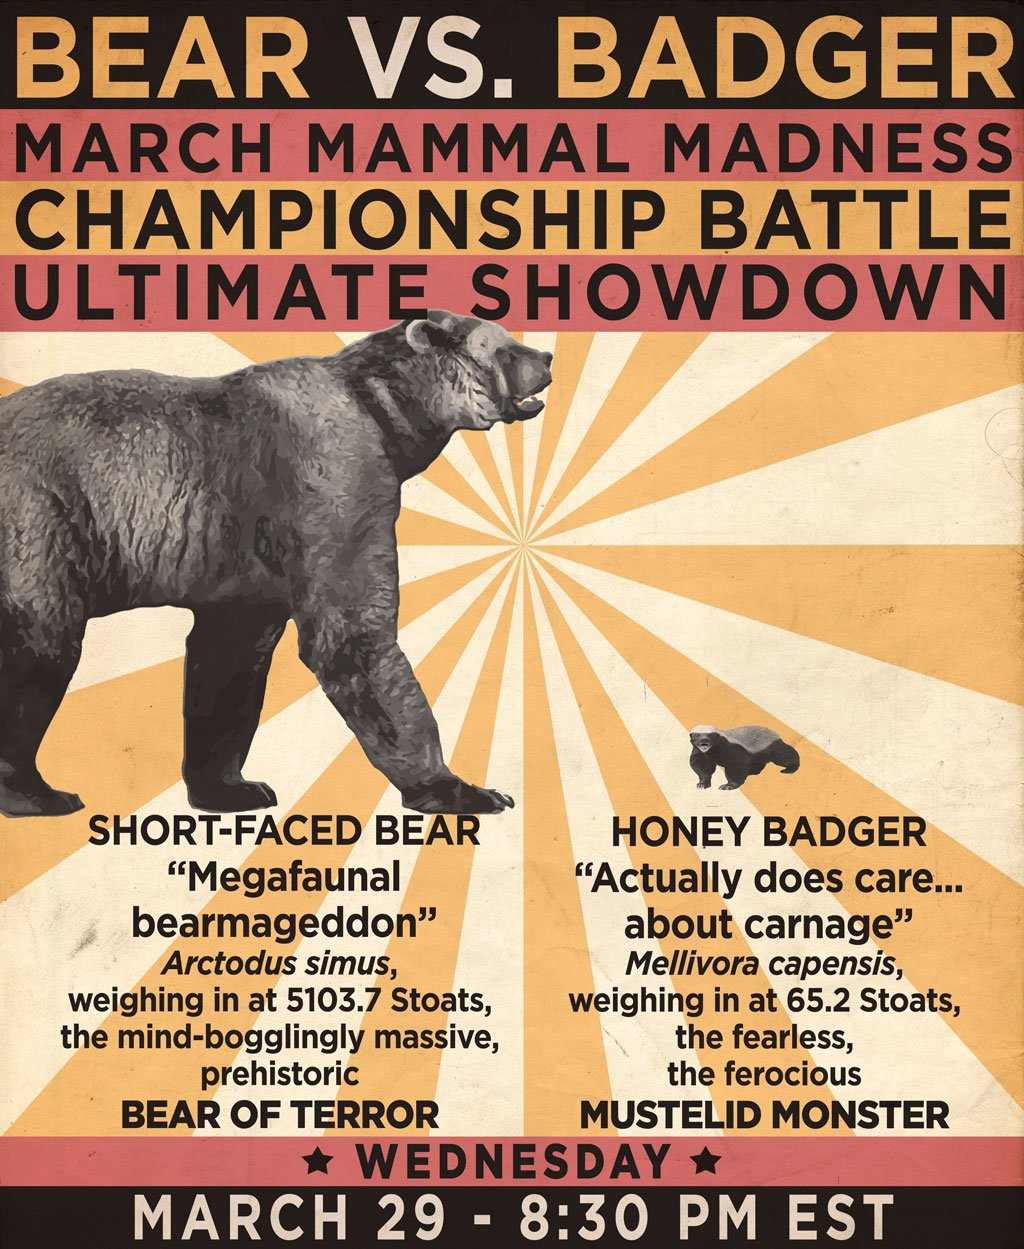 2017MMM Championship!